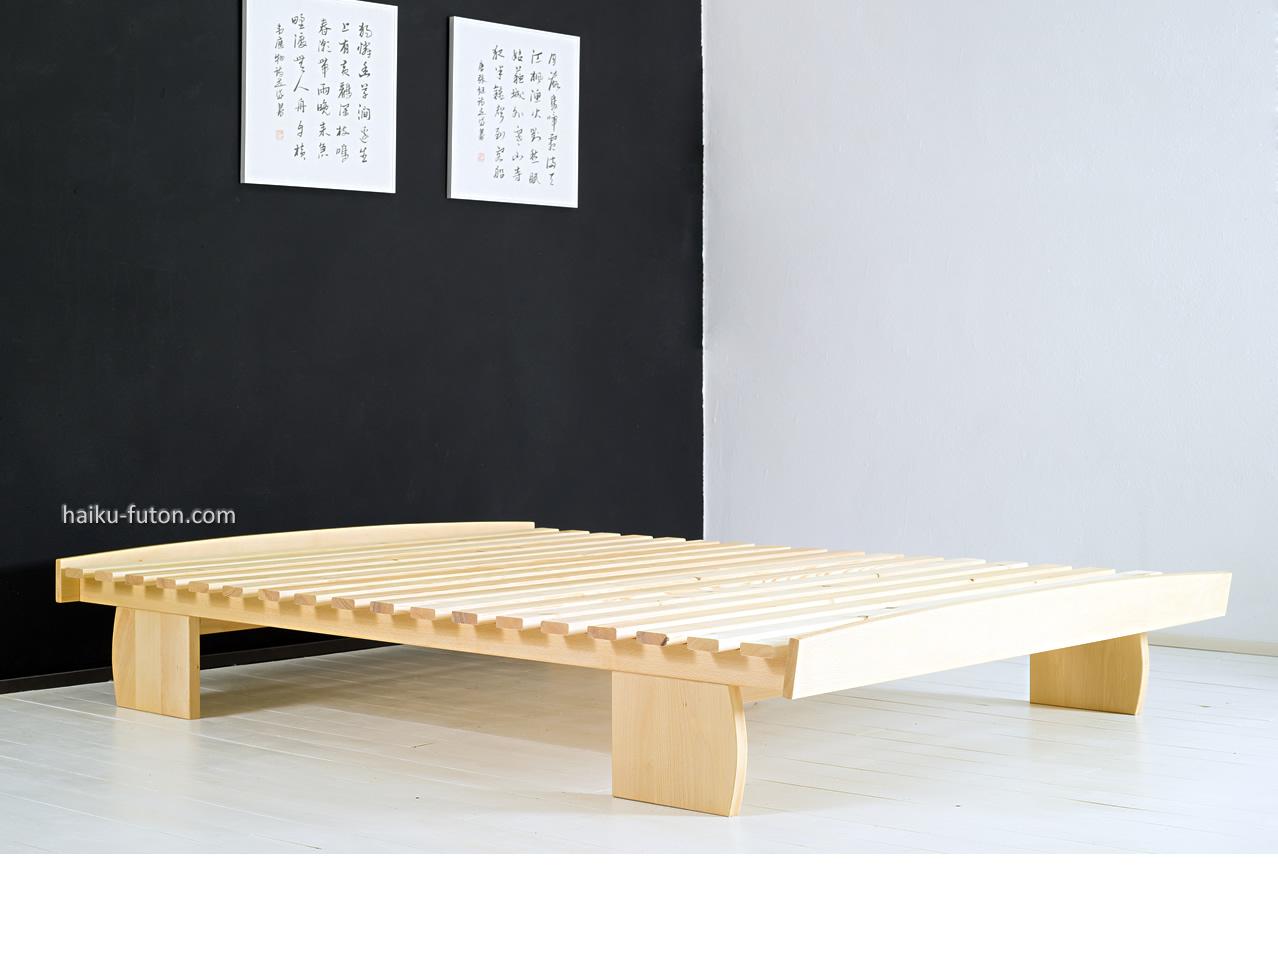 Oferta cama Open 140cm con cabecero color wenge  HaikuFuton